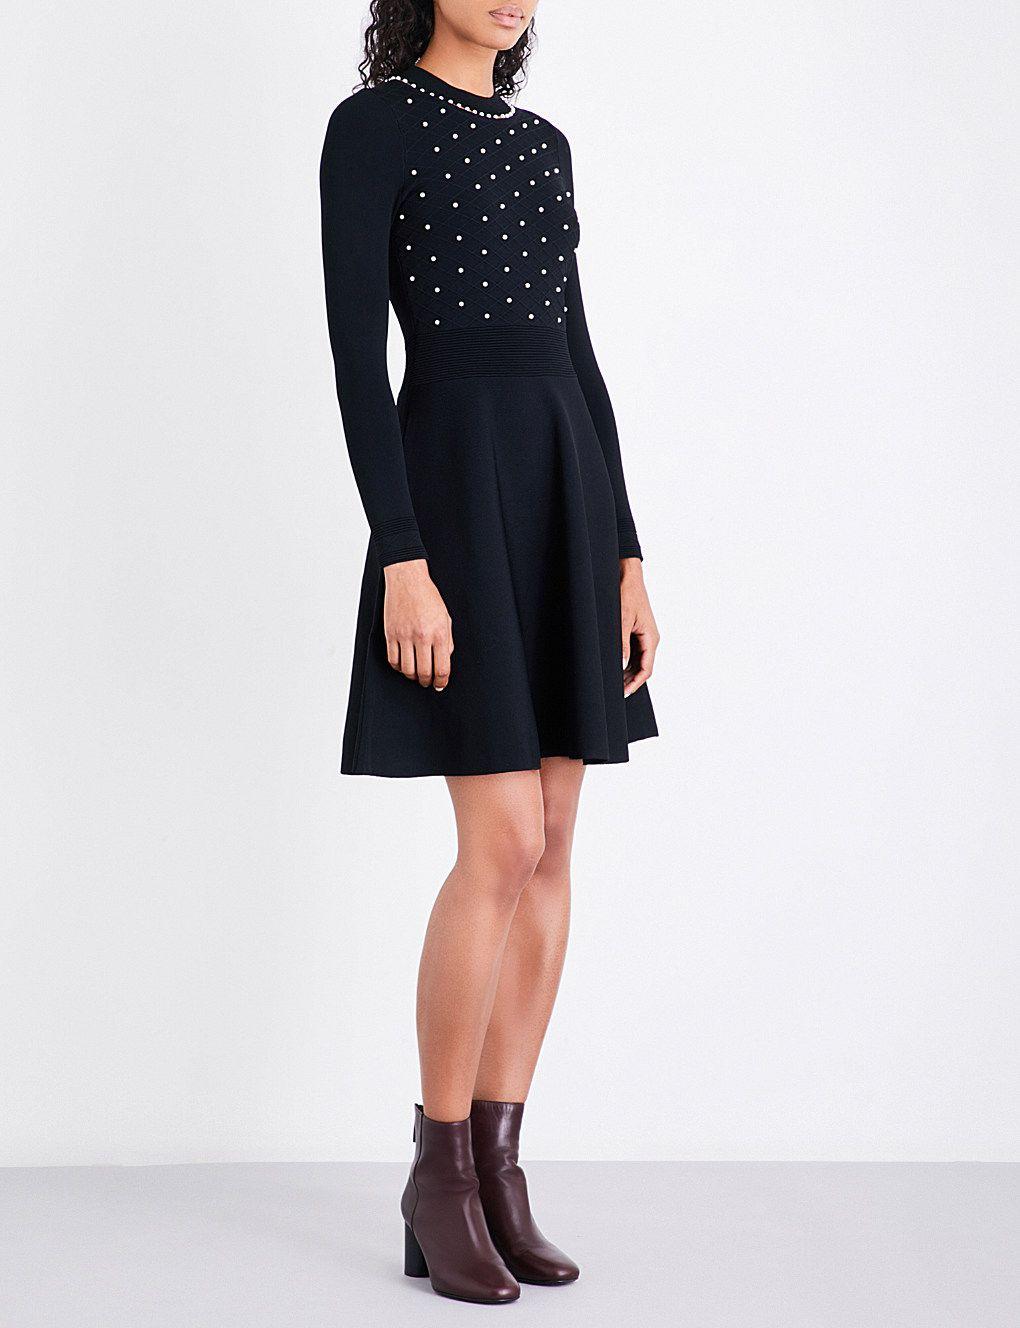 Sandro Faux Pearl Embellished Knitted Dress Selfridges Com Dresses Knit Dress Long Sleeve Dress [ 1328 x 1020 Pixel ]